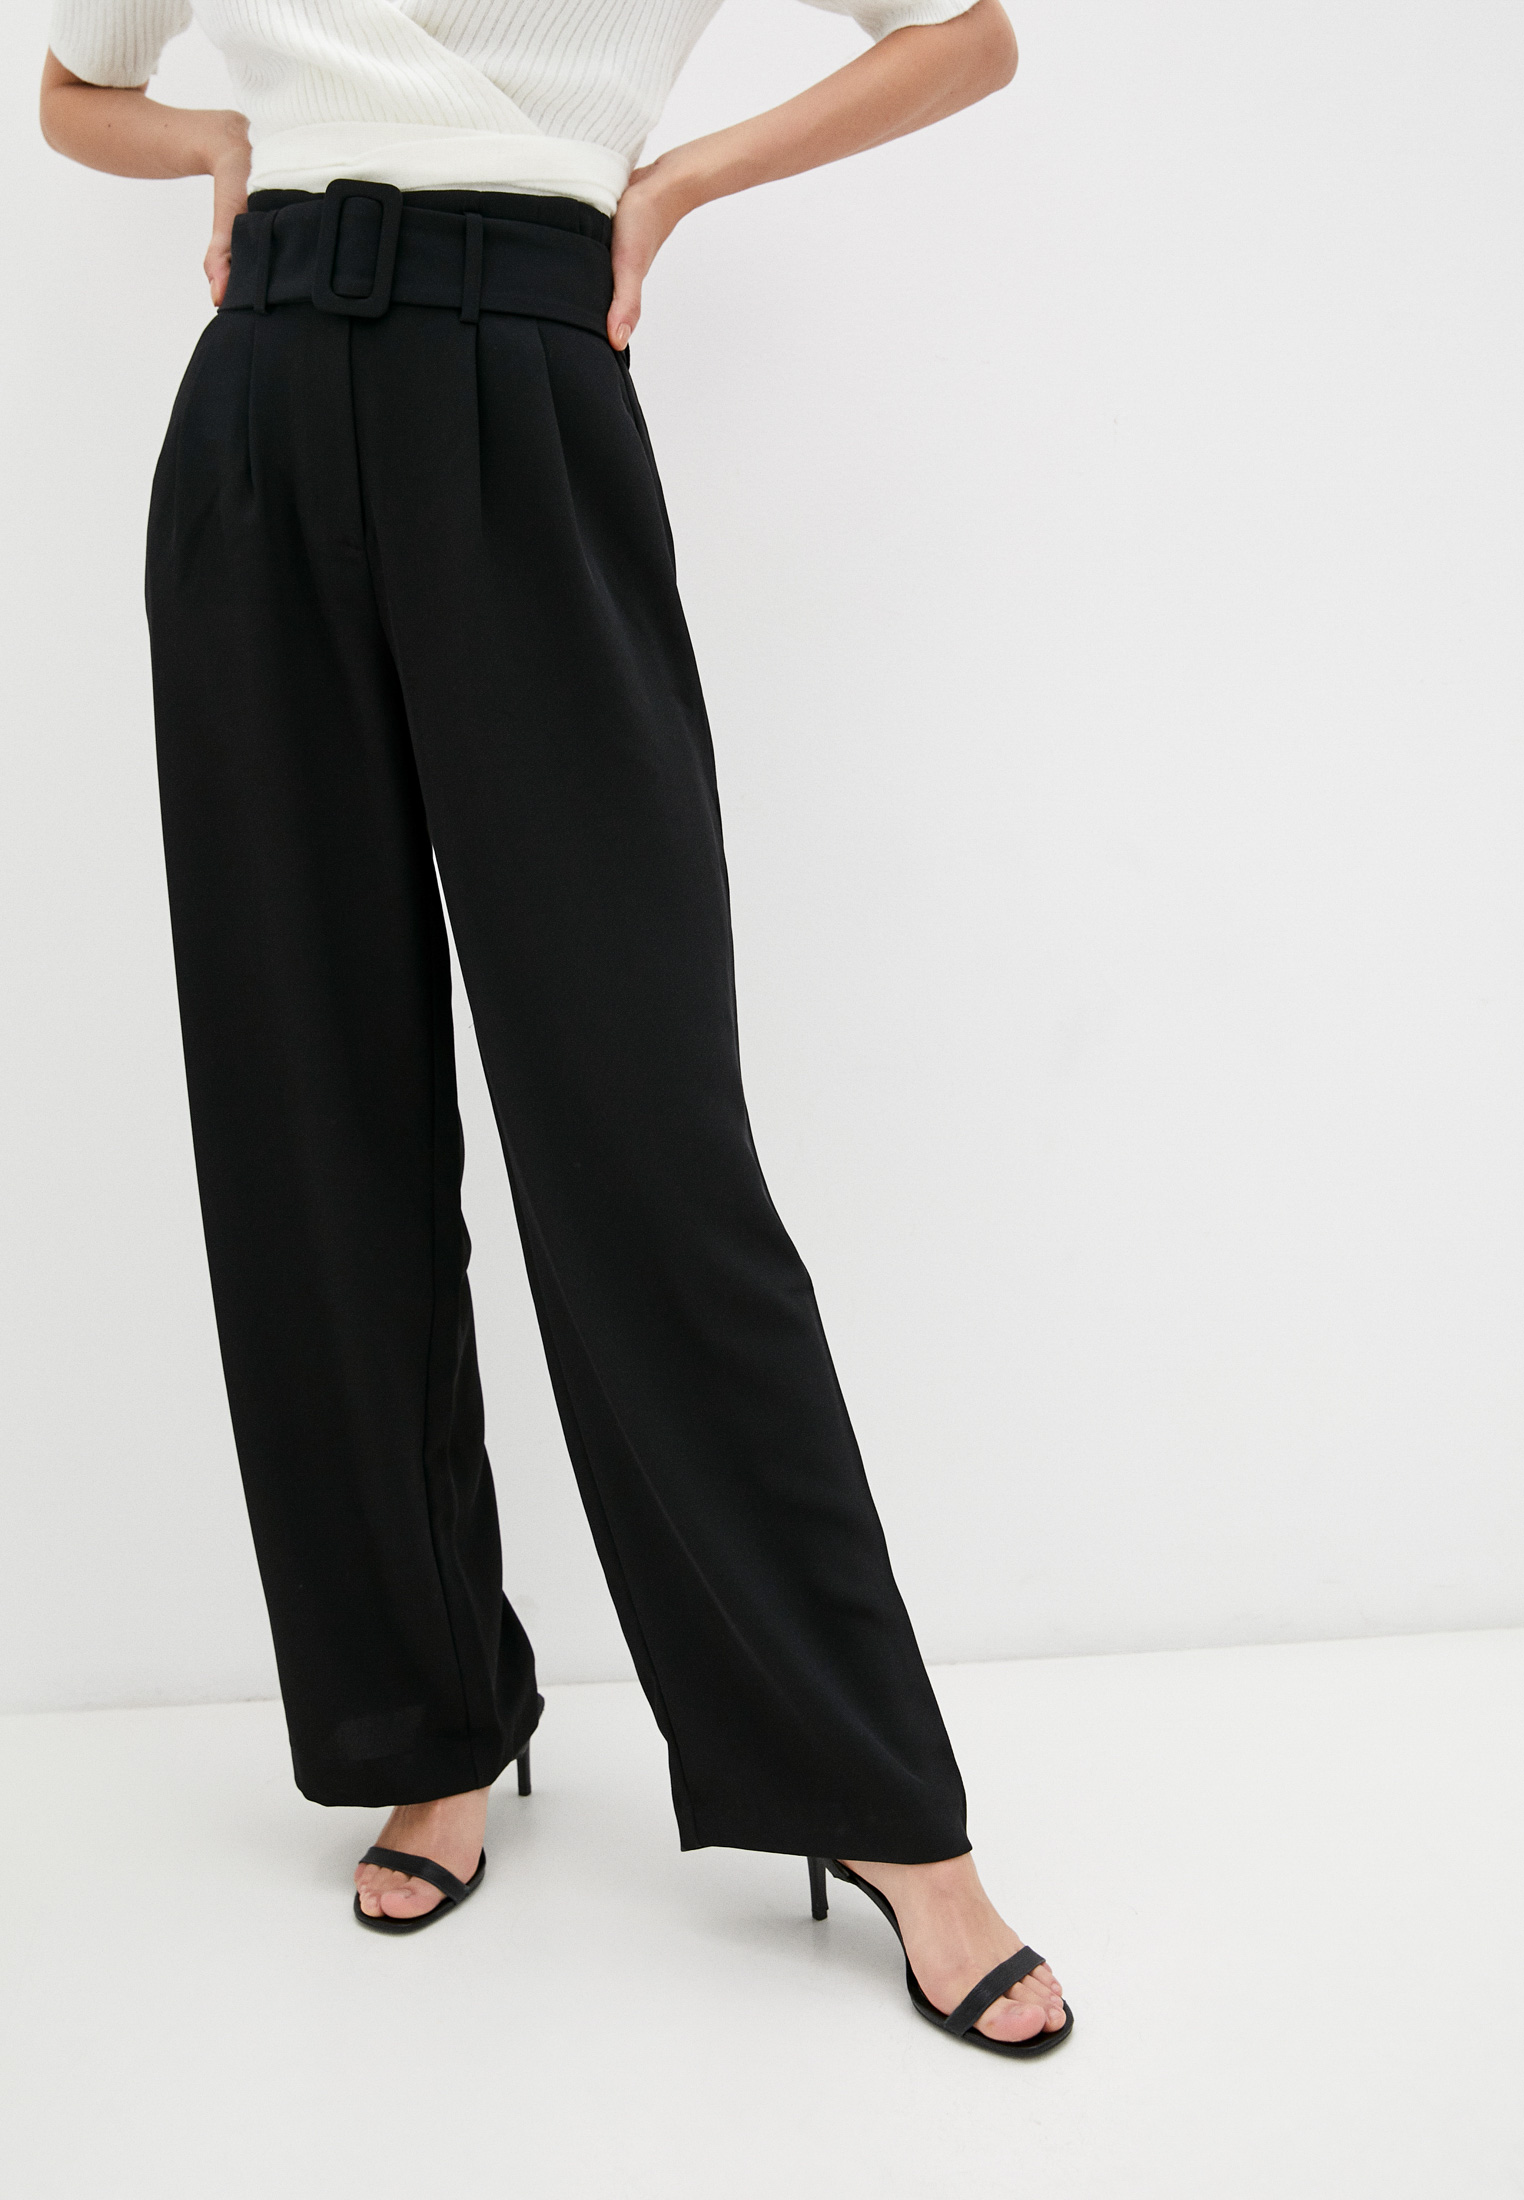 Женские классические брюки Naf Naf Брюки Naf Naf